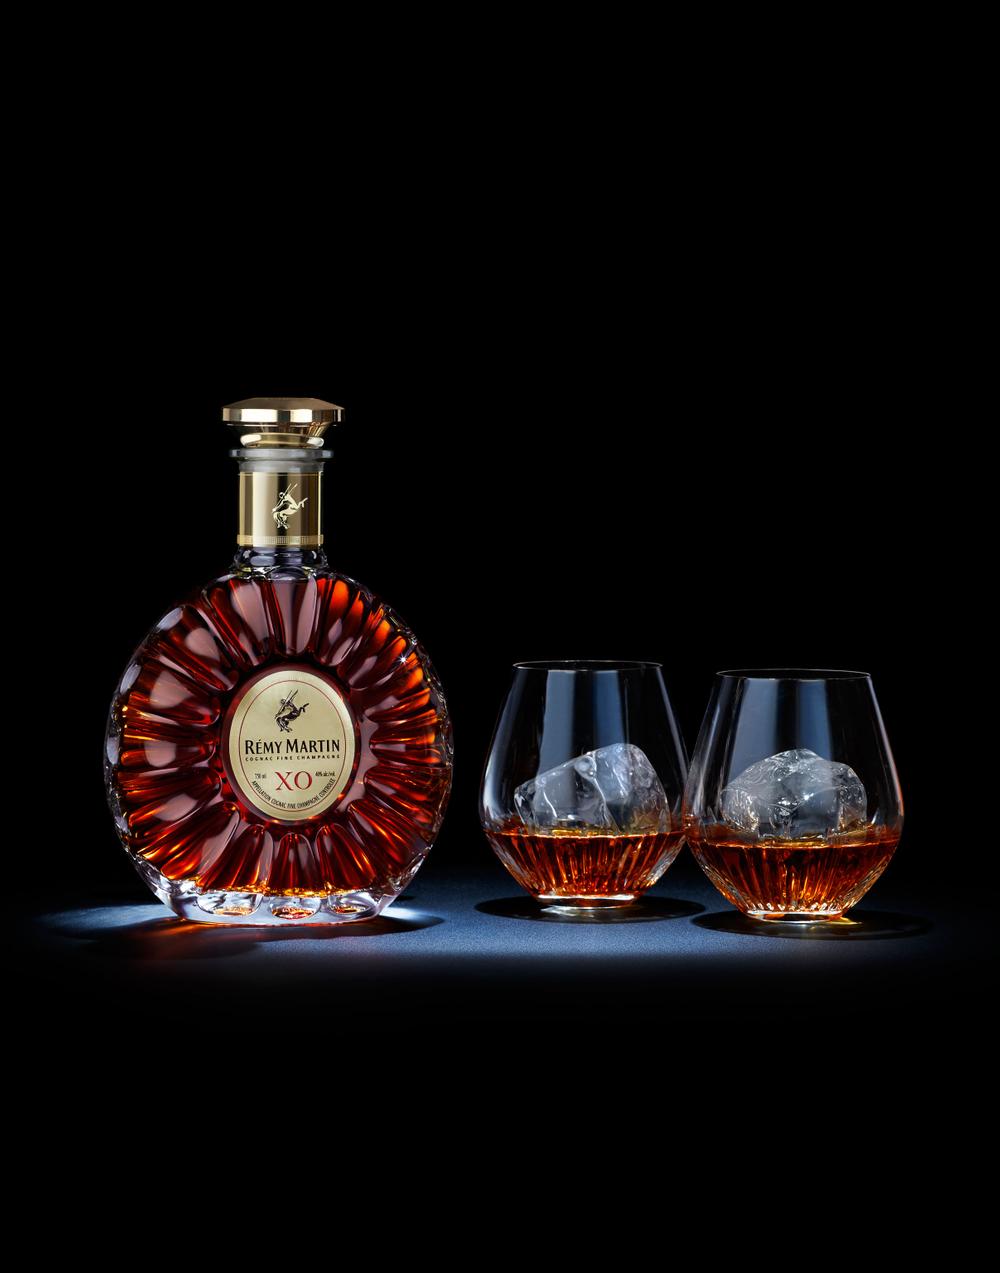 Alcohol, Spirits, Advertising, Photography